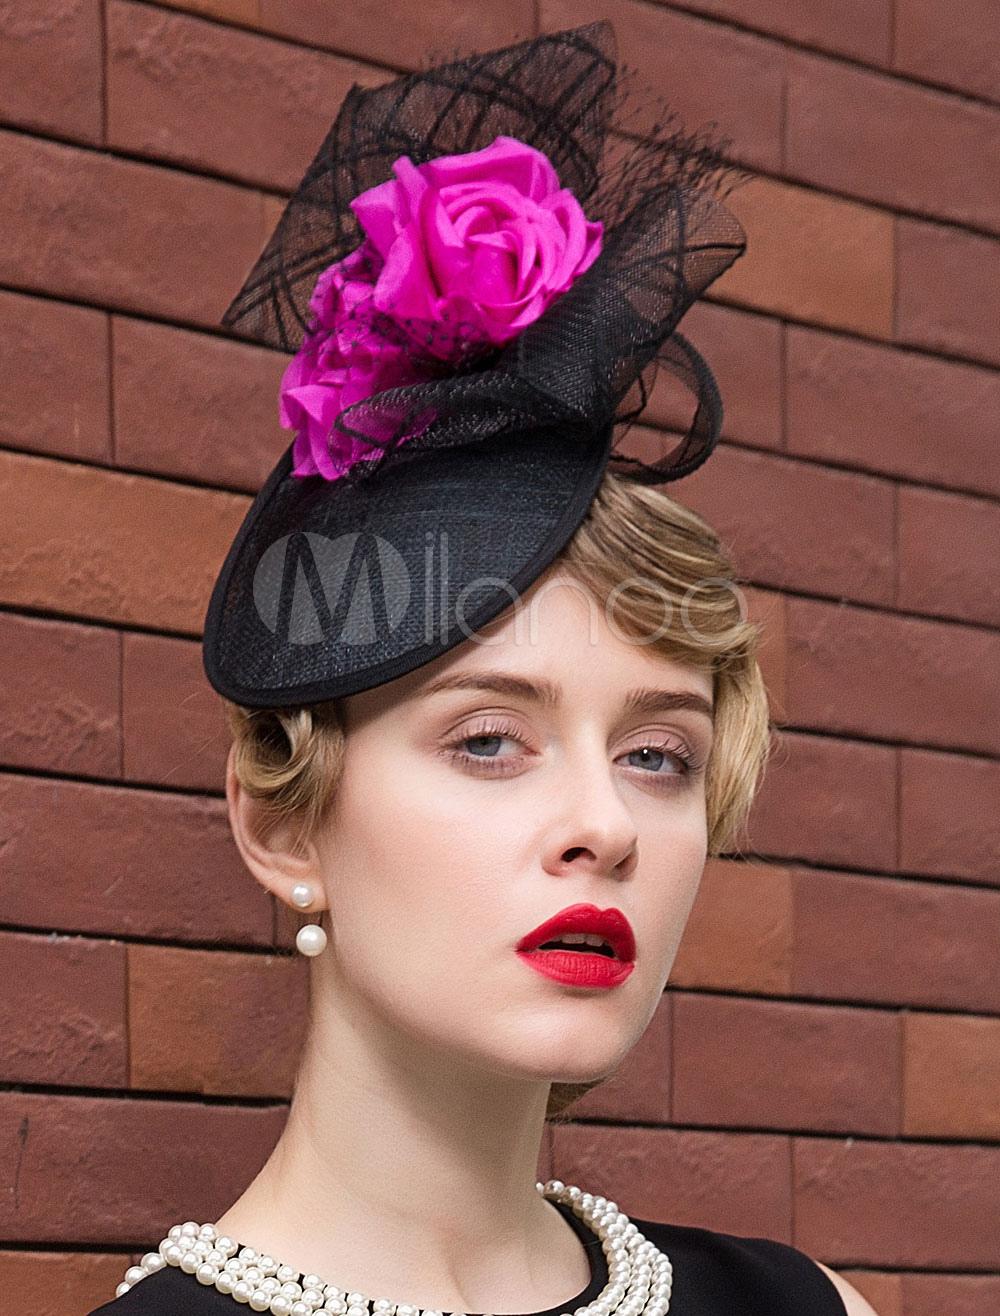 Buy Vintage Flapper Hat Linen Tulle Flower Decor Color Block Black Retro Headpiece Hat Halloween for $48.99 in Milanoo store